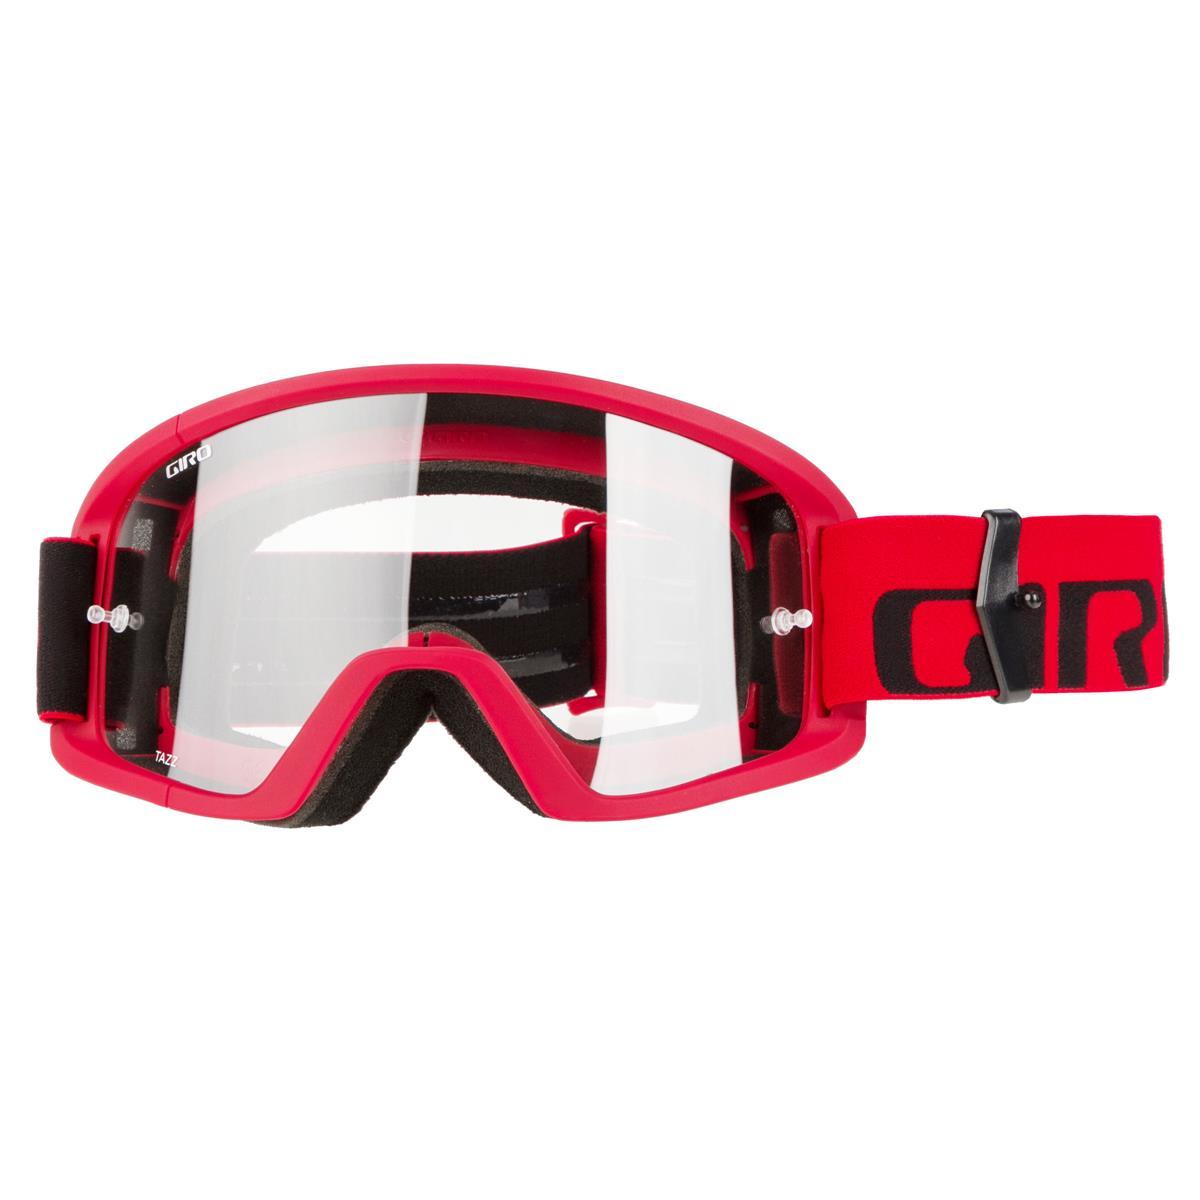 Giro Crossbrille Tazz Rot/Schwarz - Amber Klar Anti-Fog